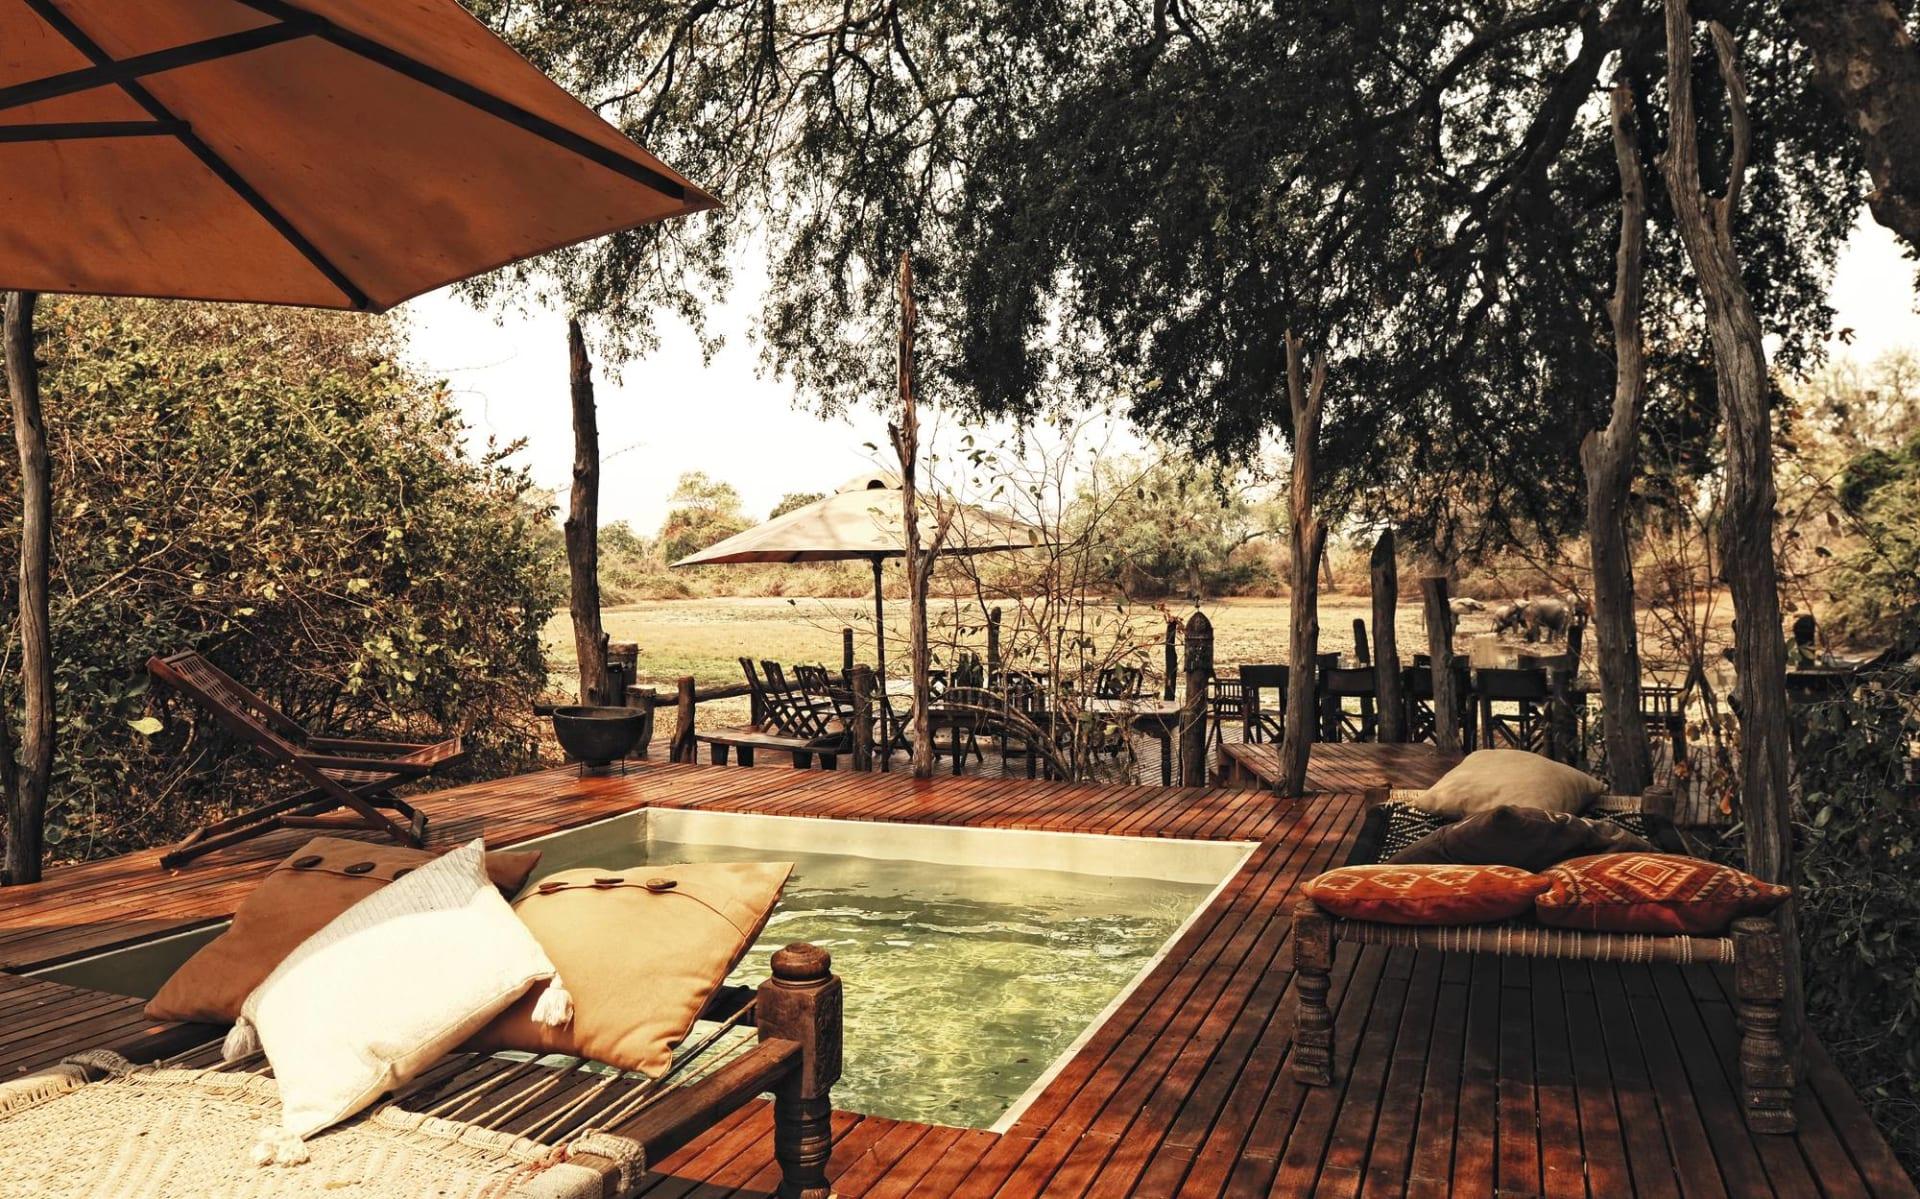 Kanga Camp in Mana Pools Nationalpark: exterior Kanga Camp Pool und Liegestühle